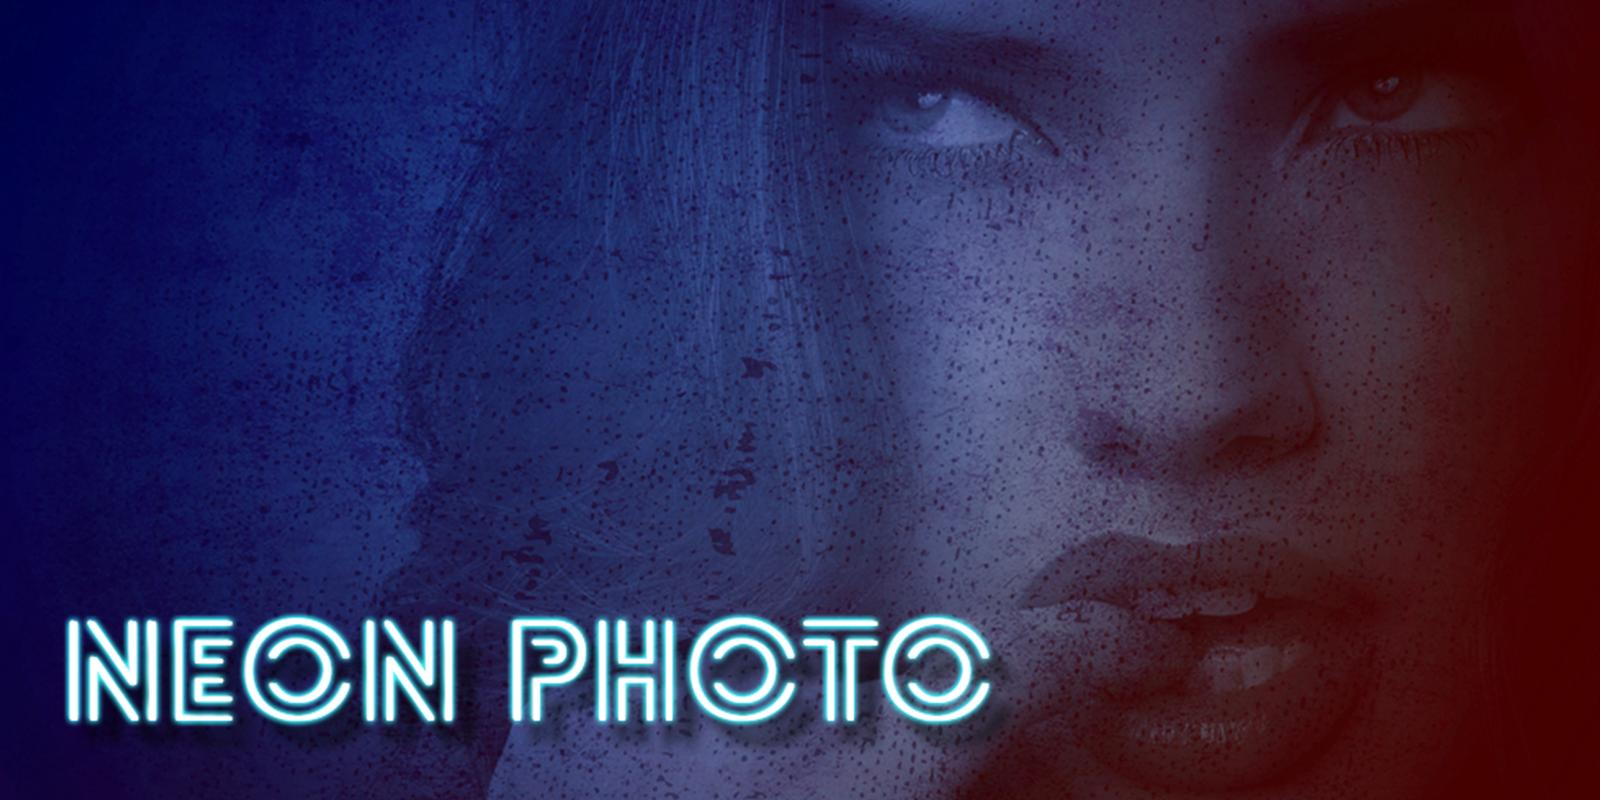 Edit Photo Editor - Neon Effect Image Editor